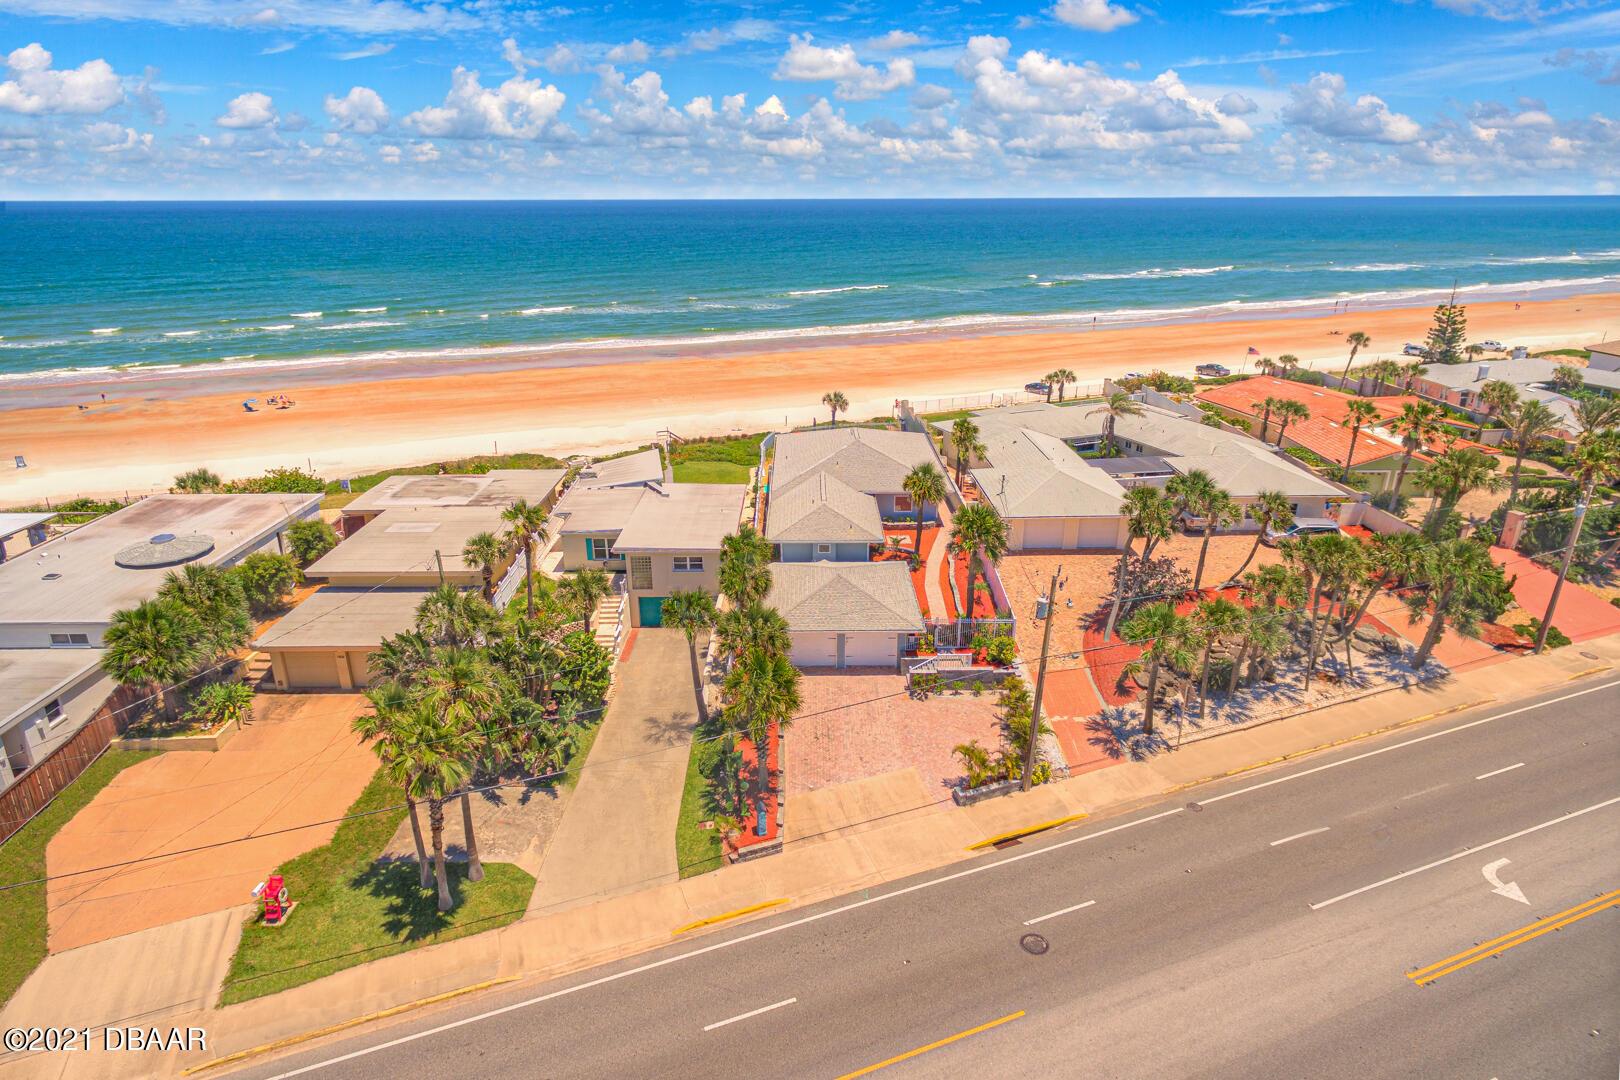 Photo of 1800 N Atlantic Avenue, Daytona Beach, FL 32118